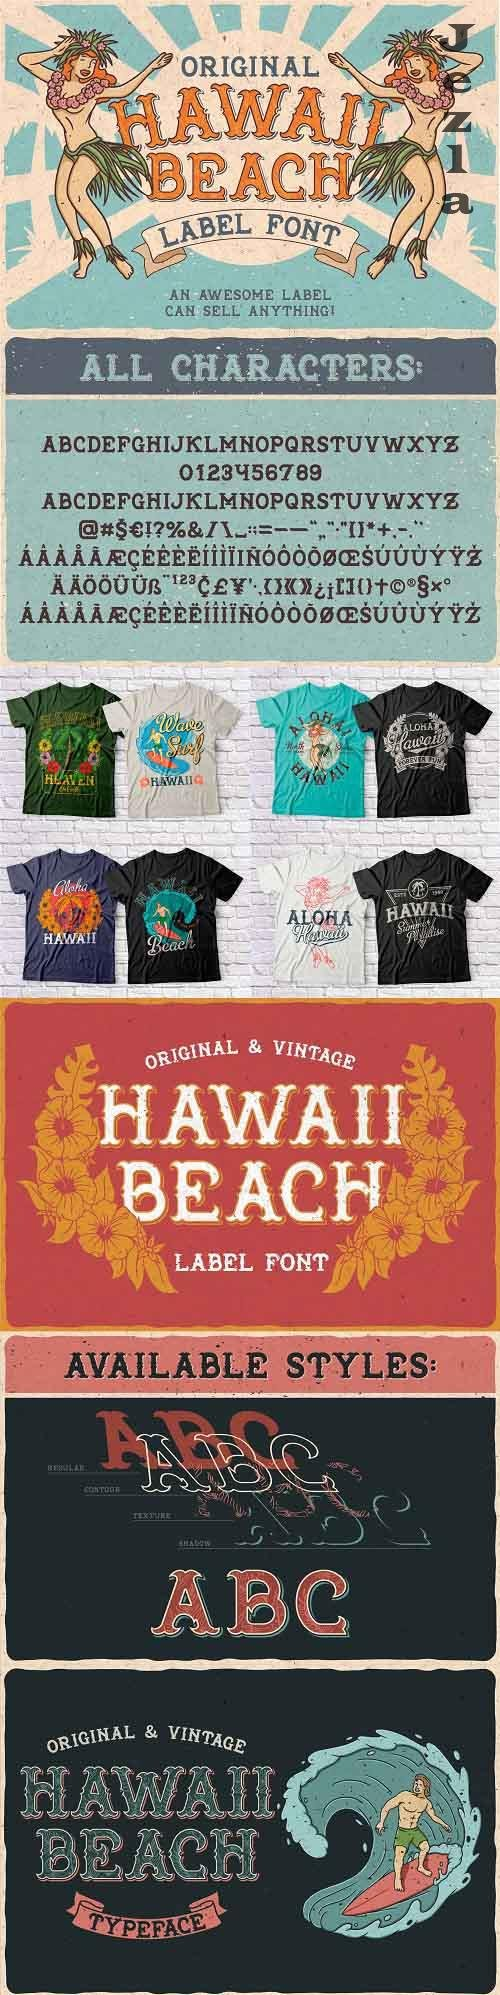 Hawaii Beach. Font & T-shirts - 24658585 - 4101621